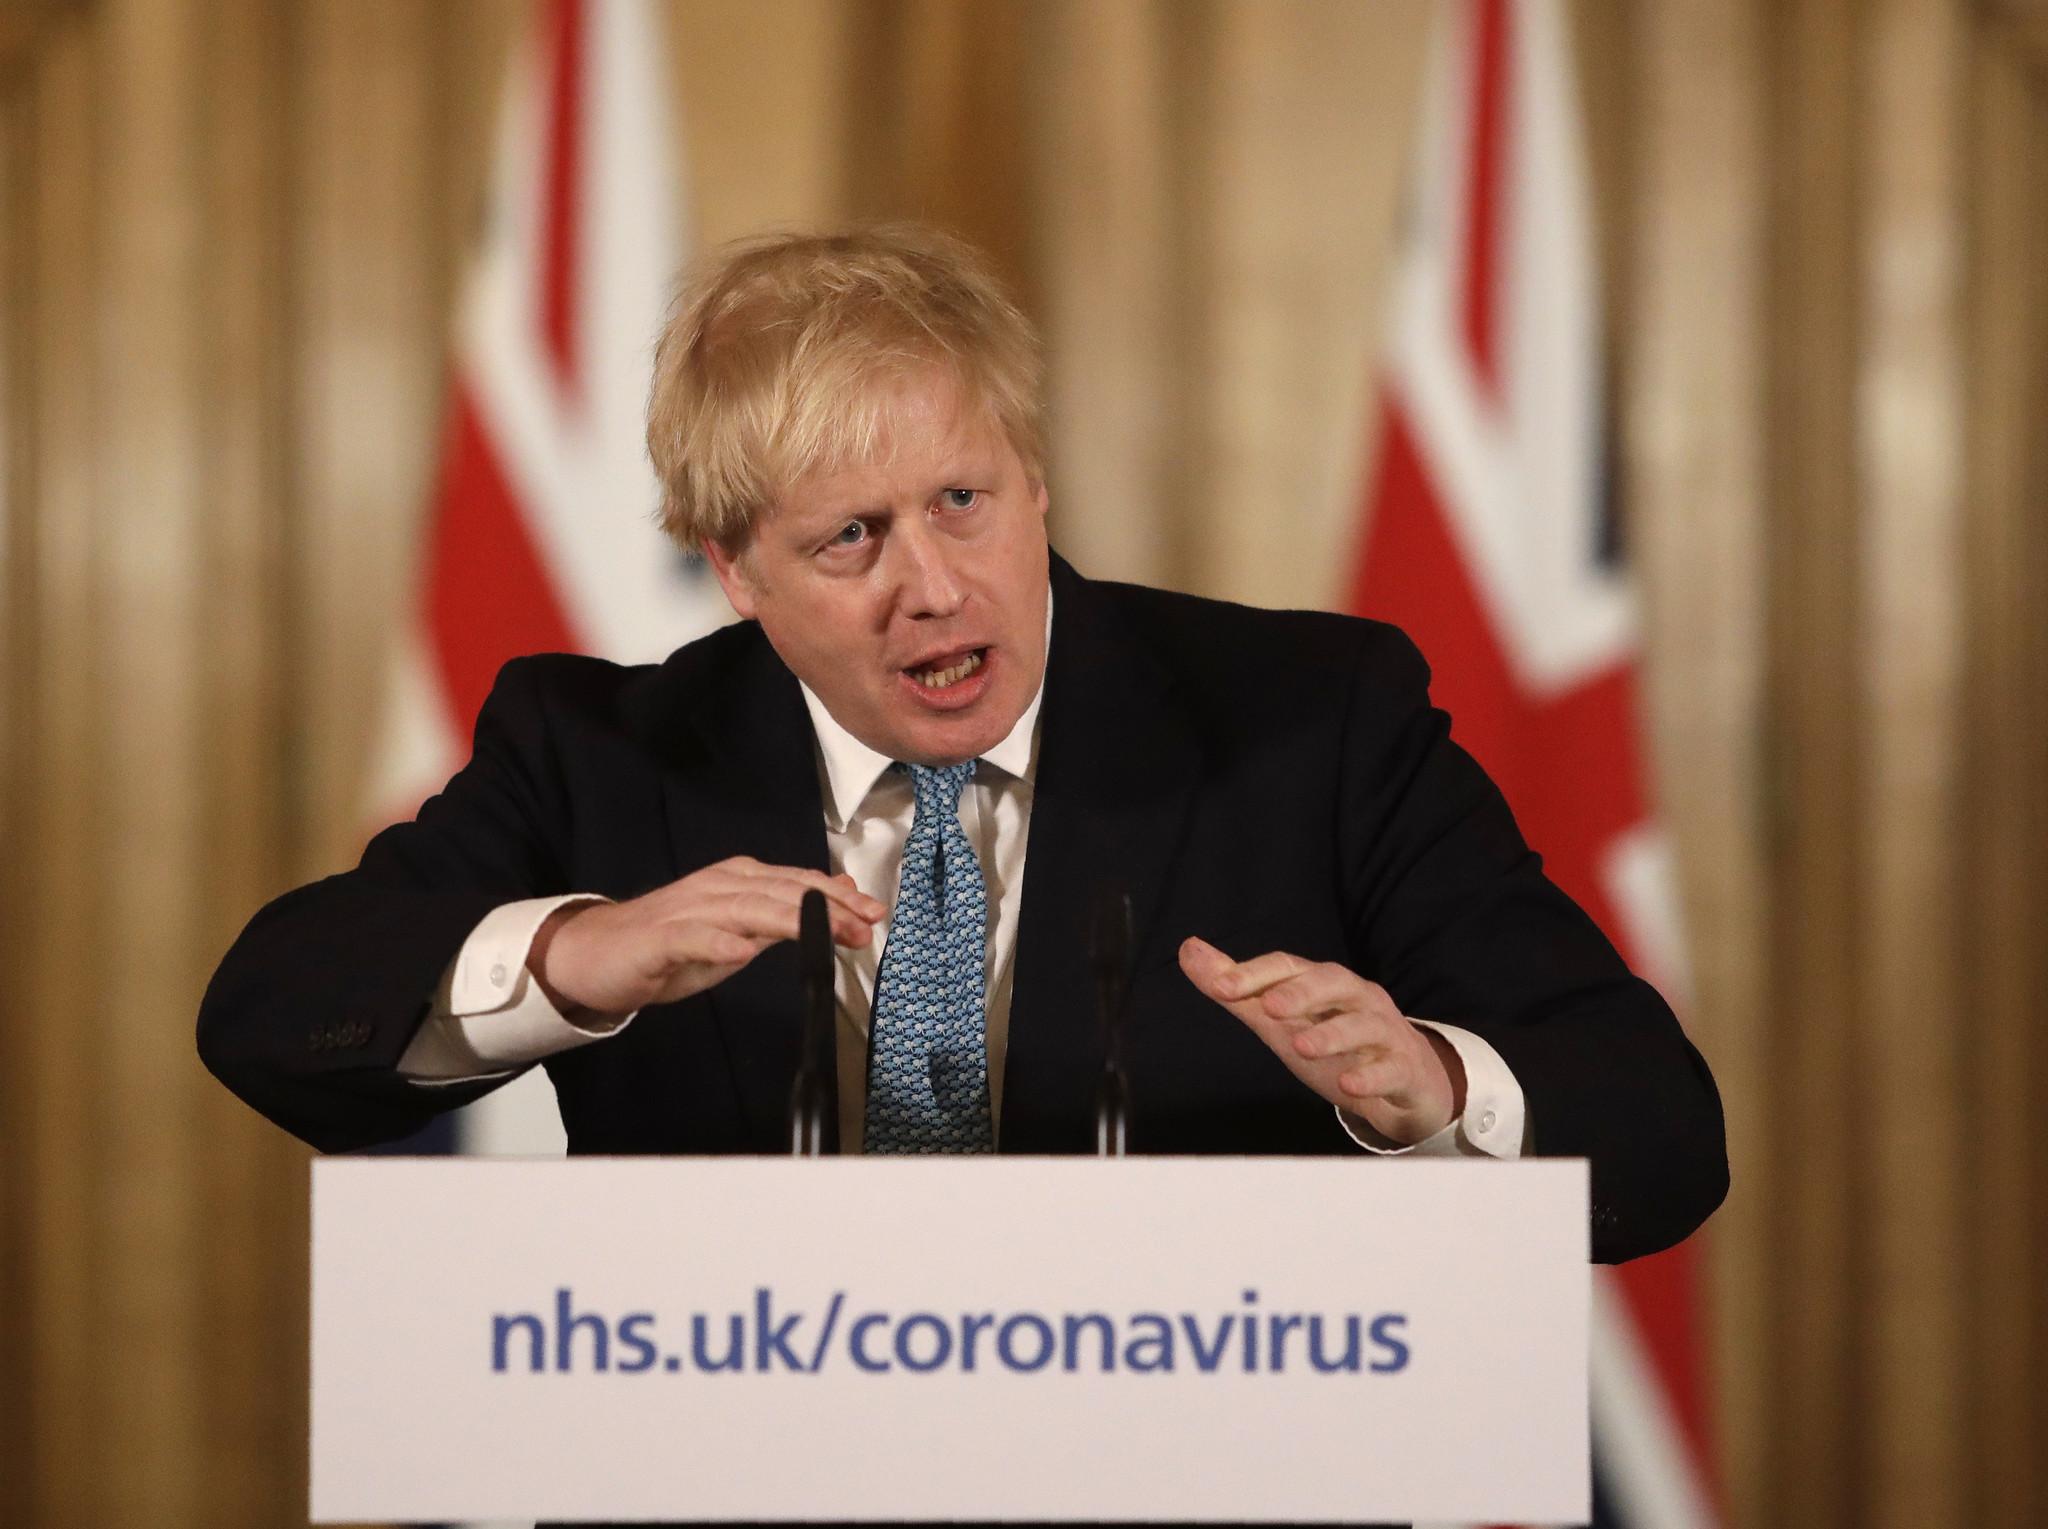 UK Prime Minister Boris Johnson in ICU with coronavirus